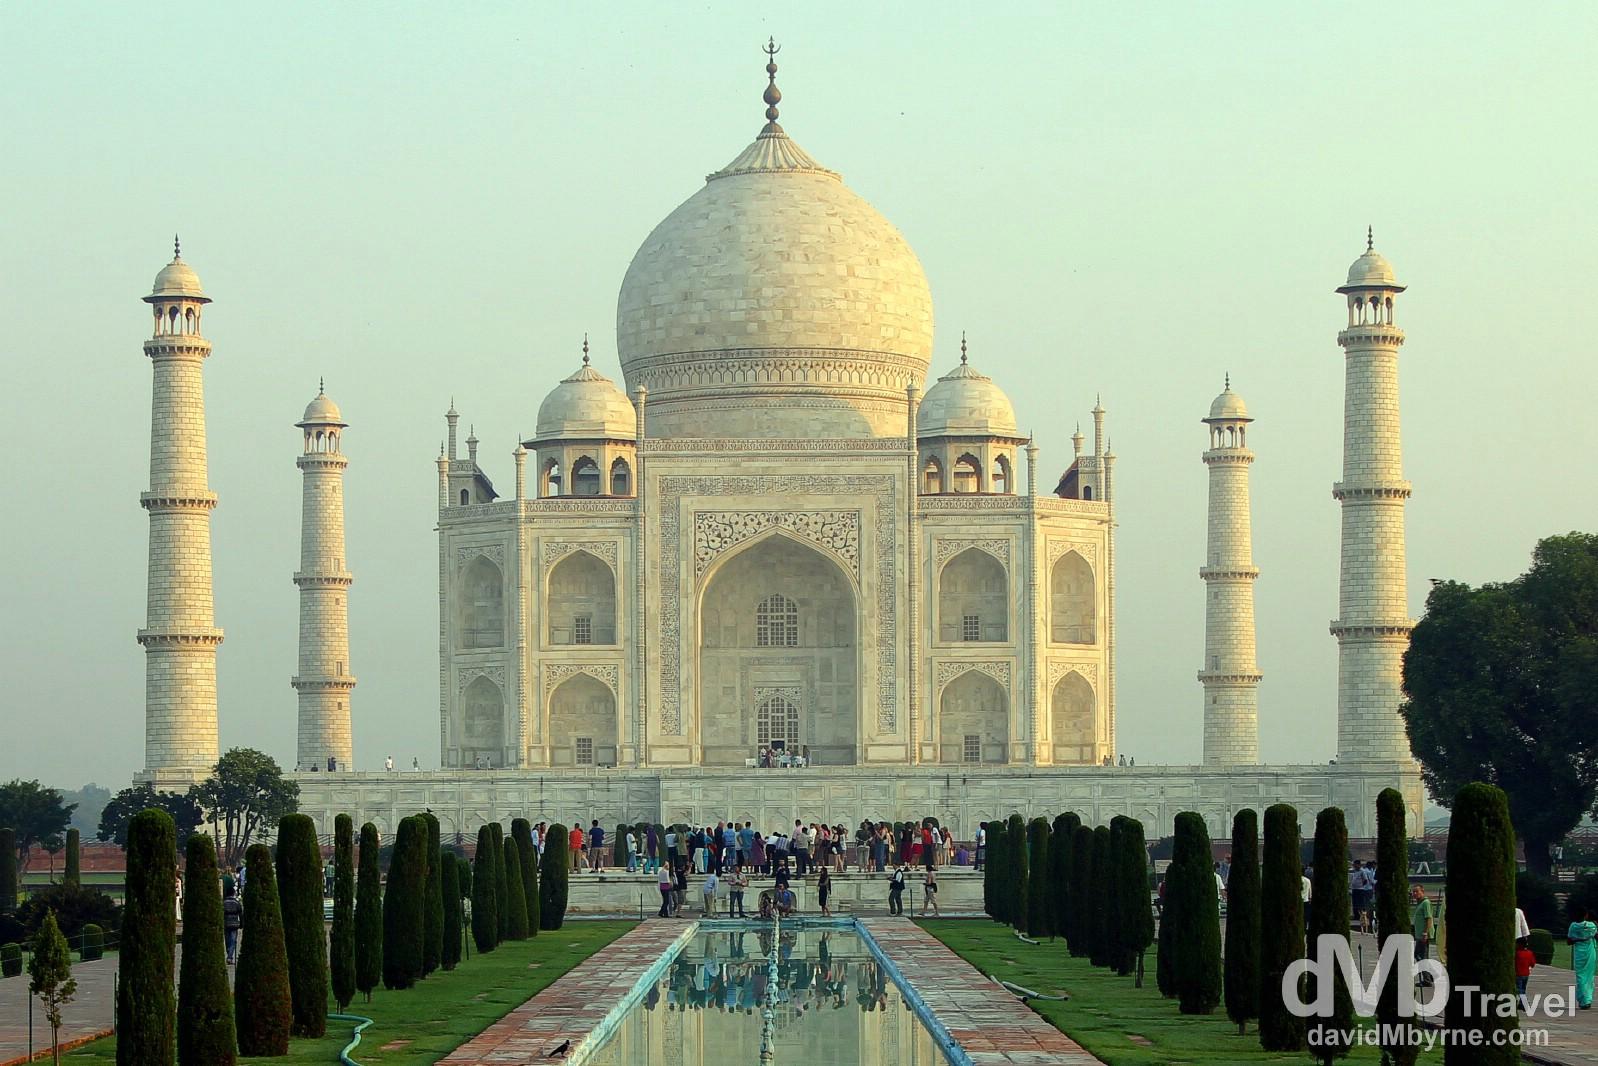 The TaJ Mahal shortly after sunrise. Agra, Uttar Pradesh, India. October 11th 2012.